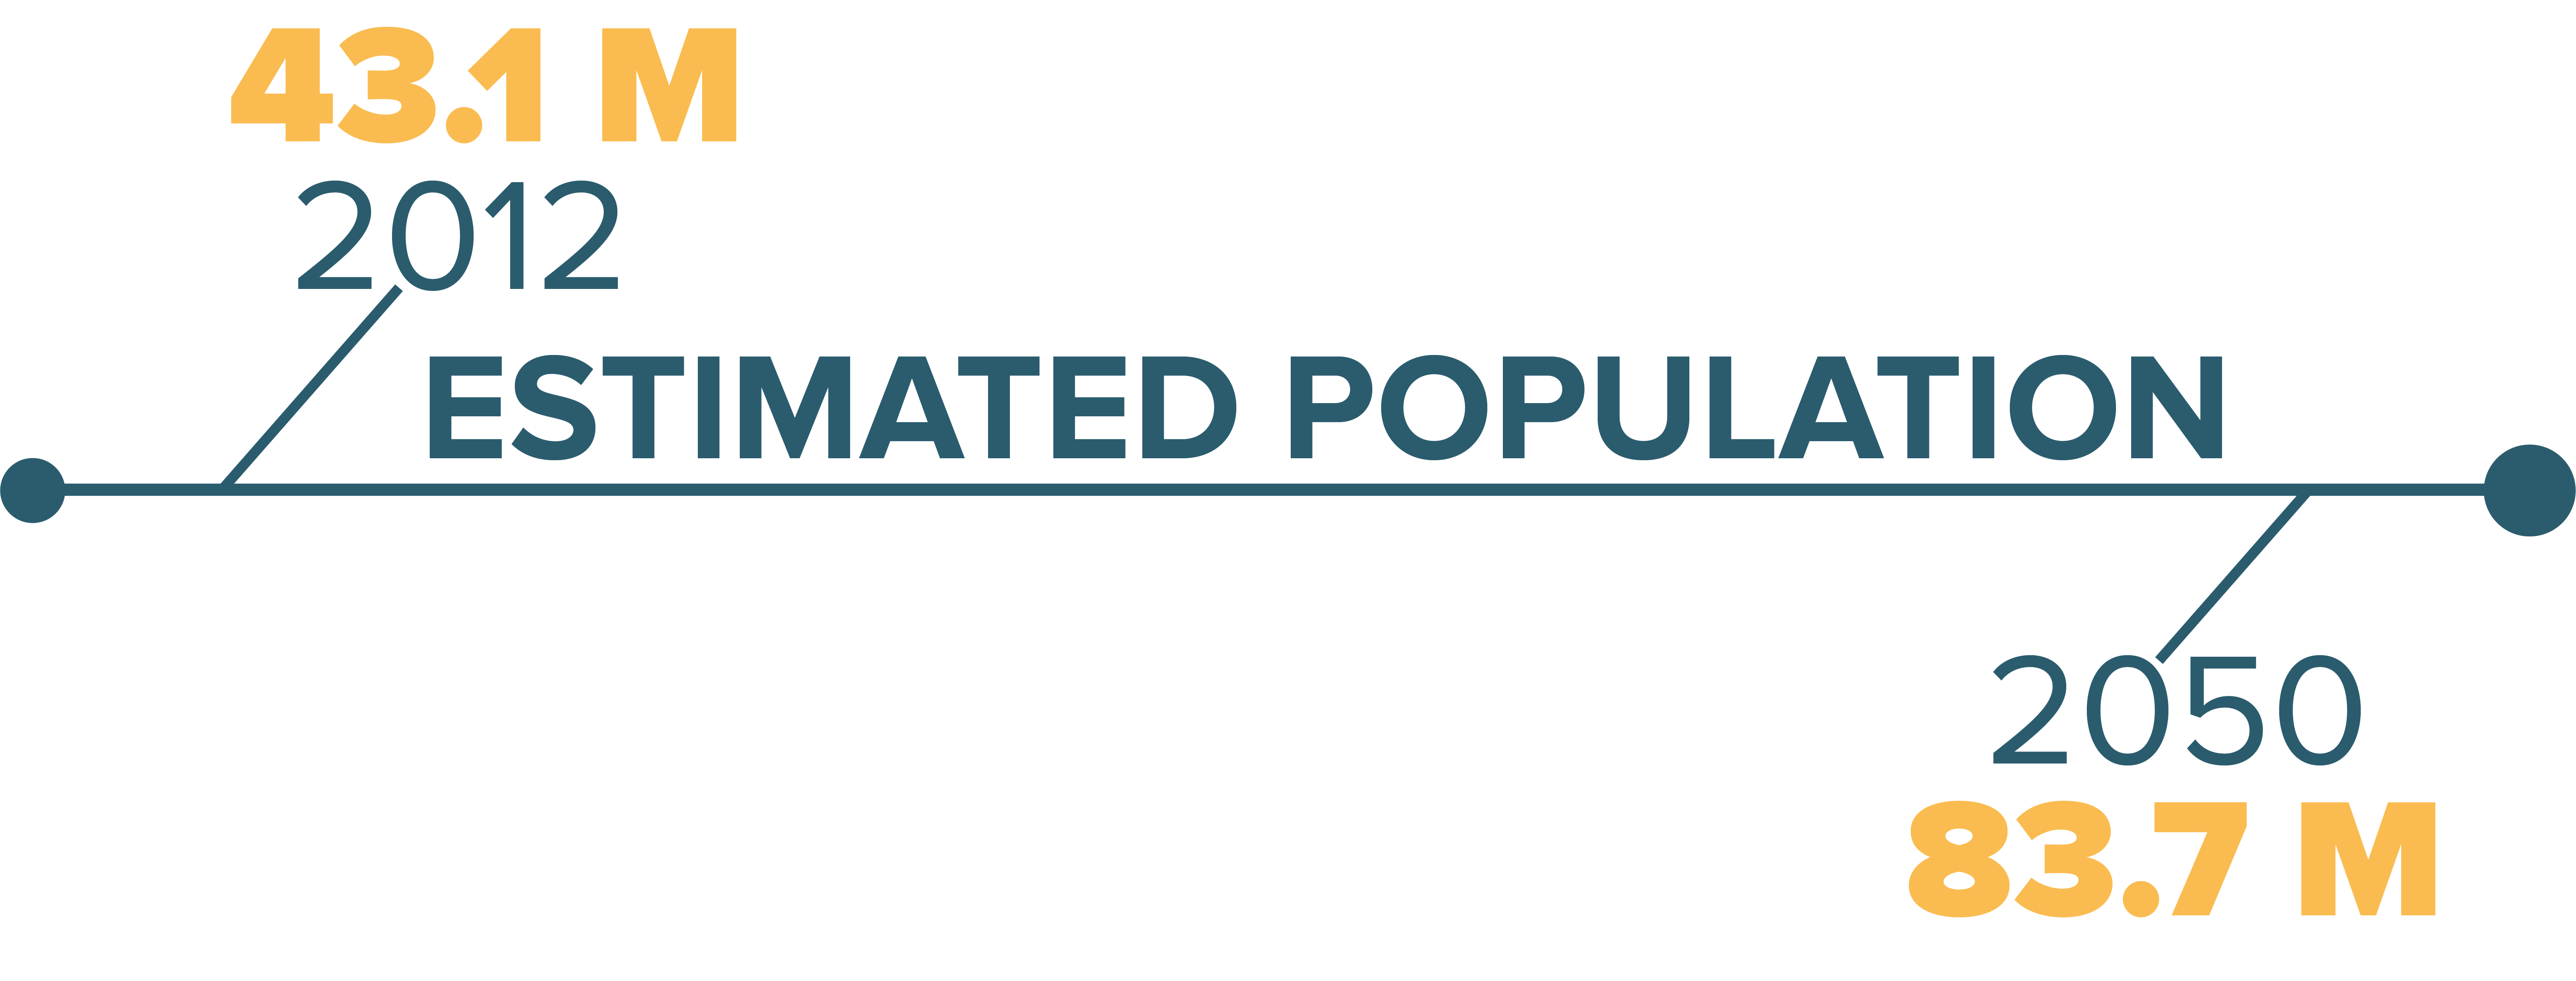 ESTIMATED POPULATION